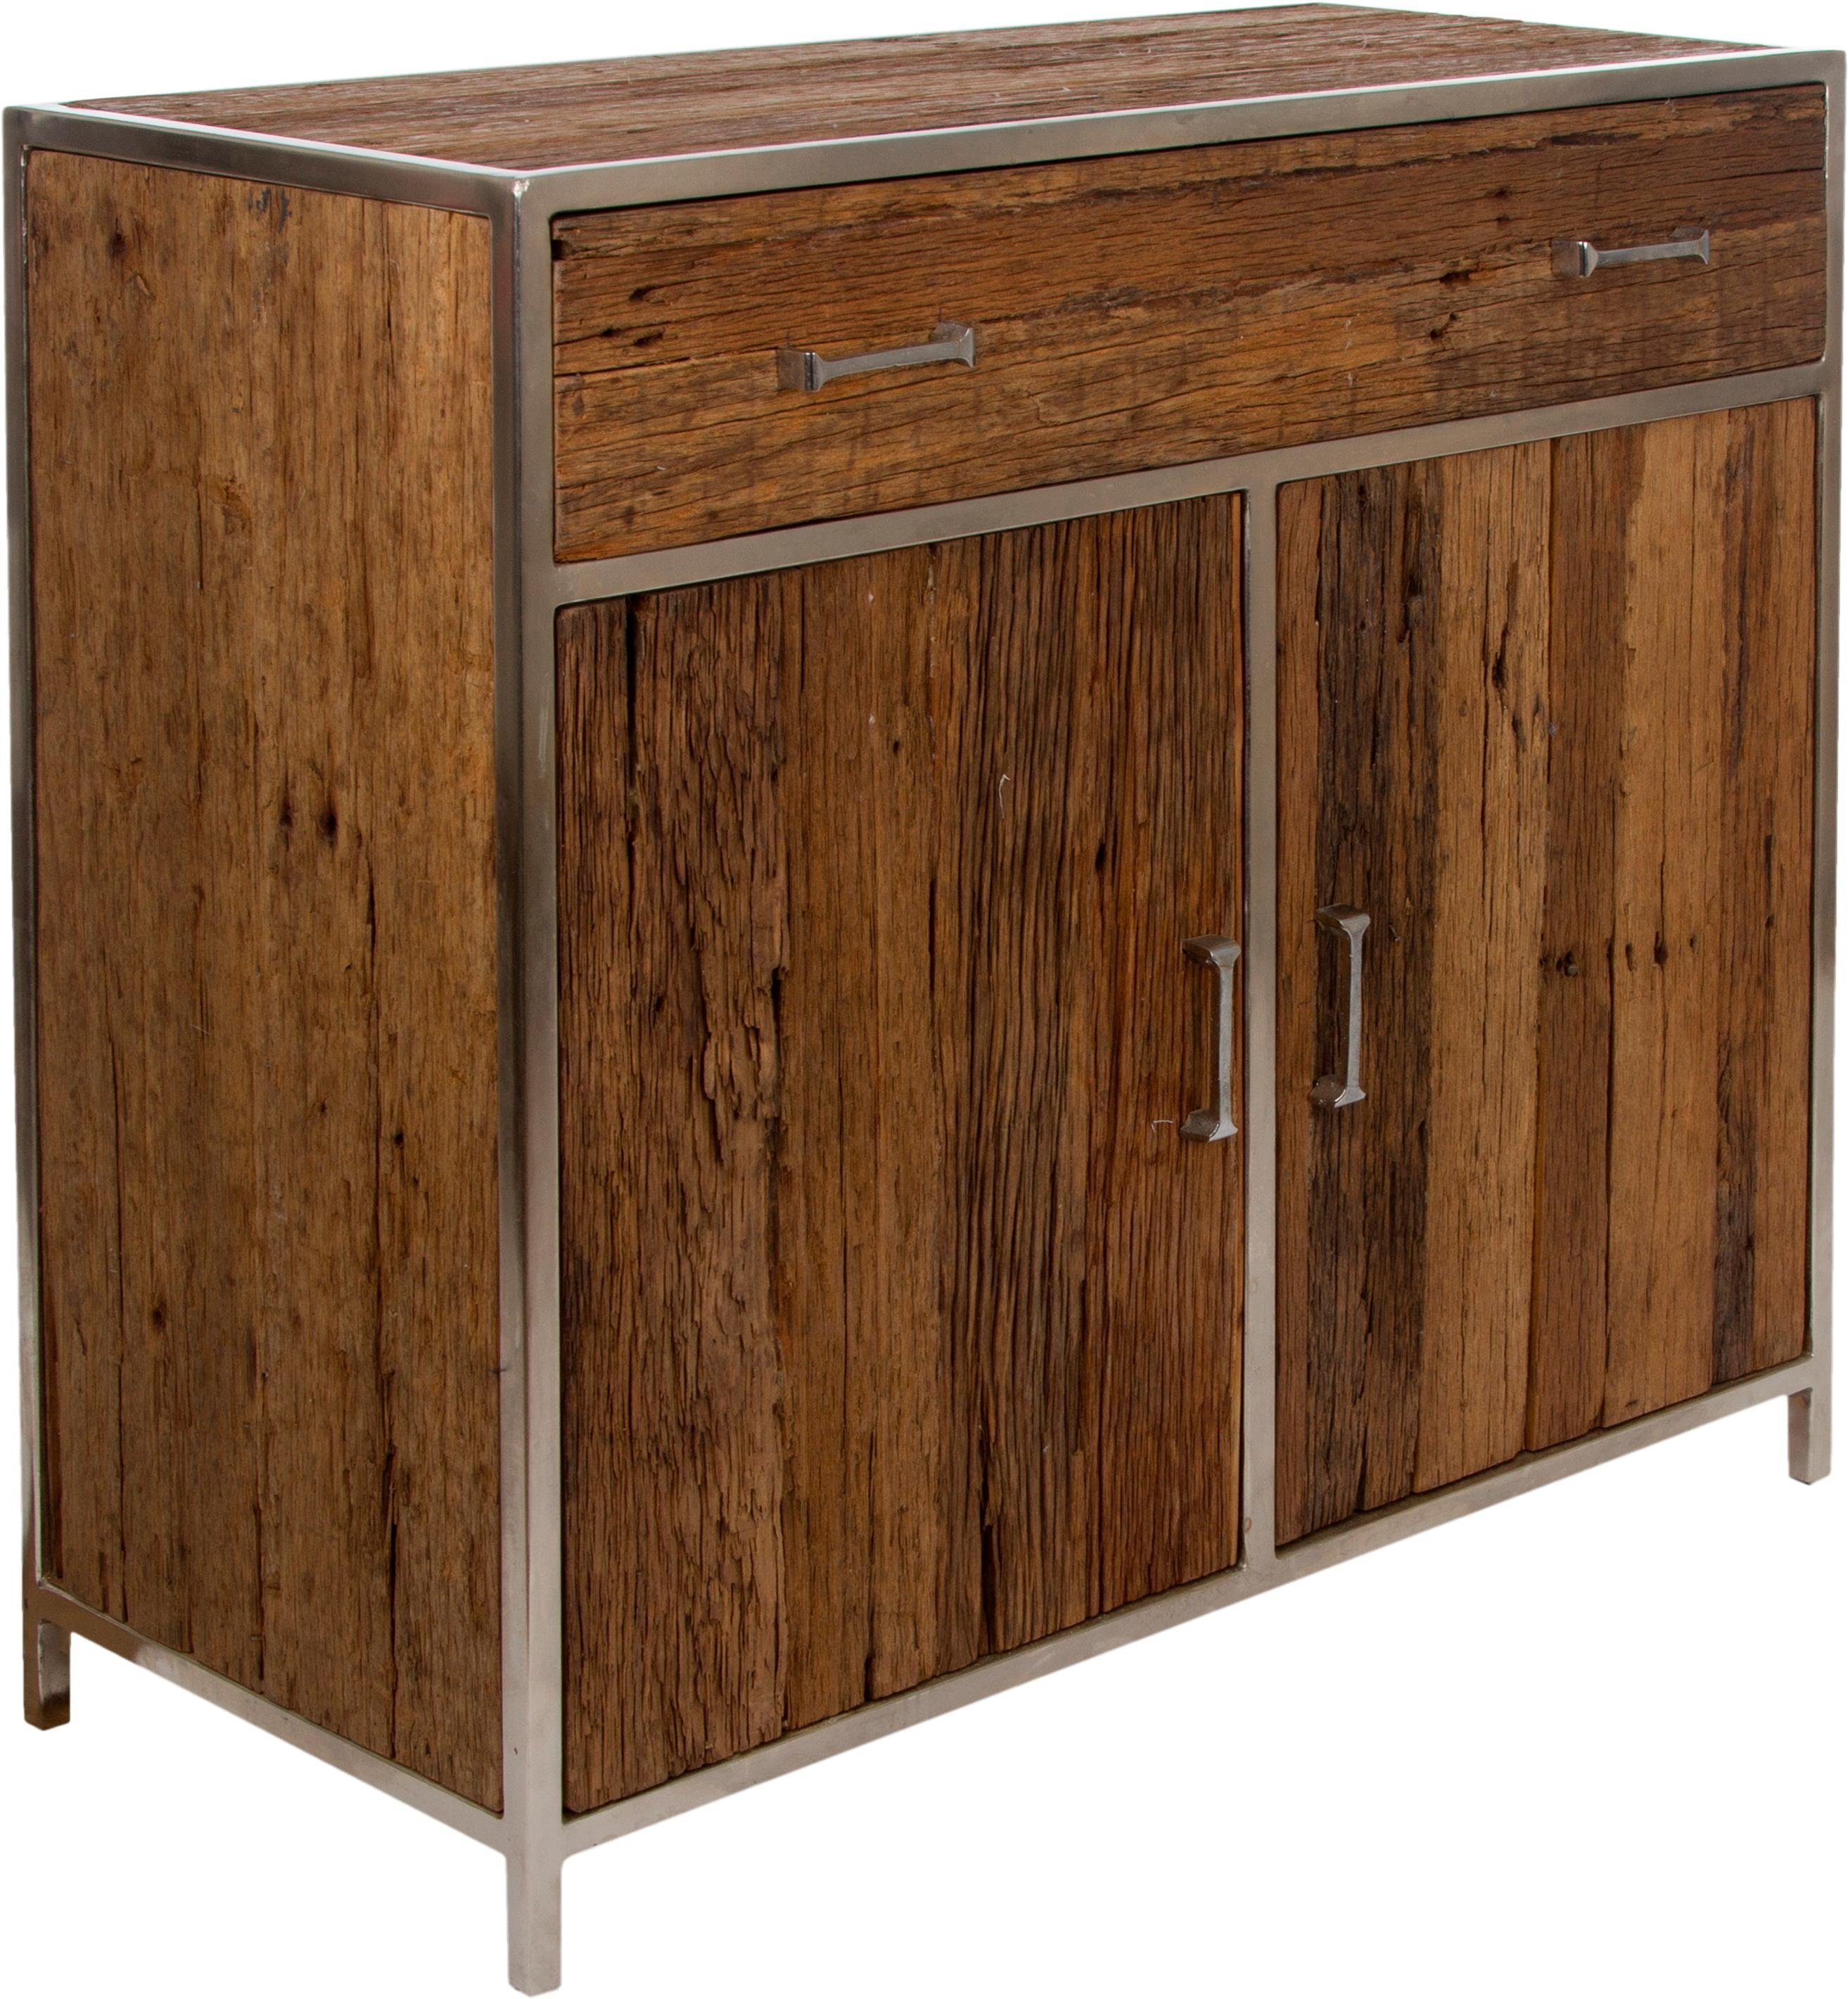 Home affaire Sideboard »Leno«, 2 Türen, 1 Schublade